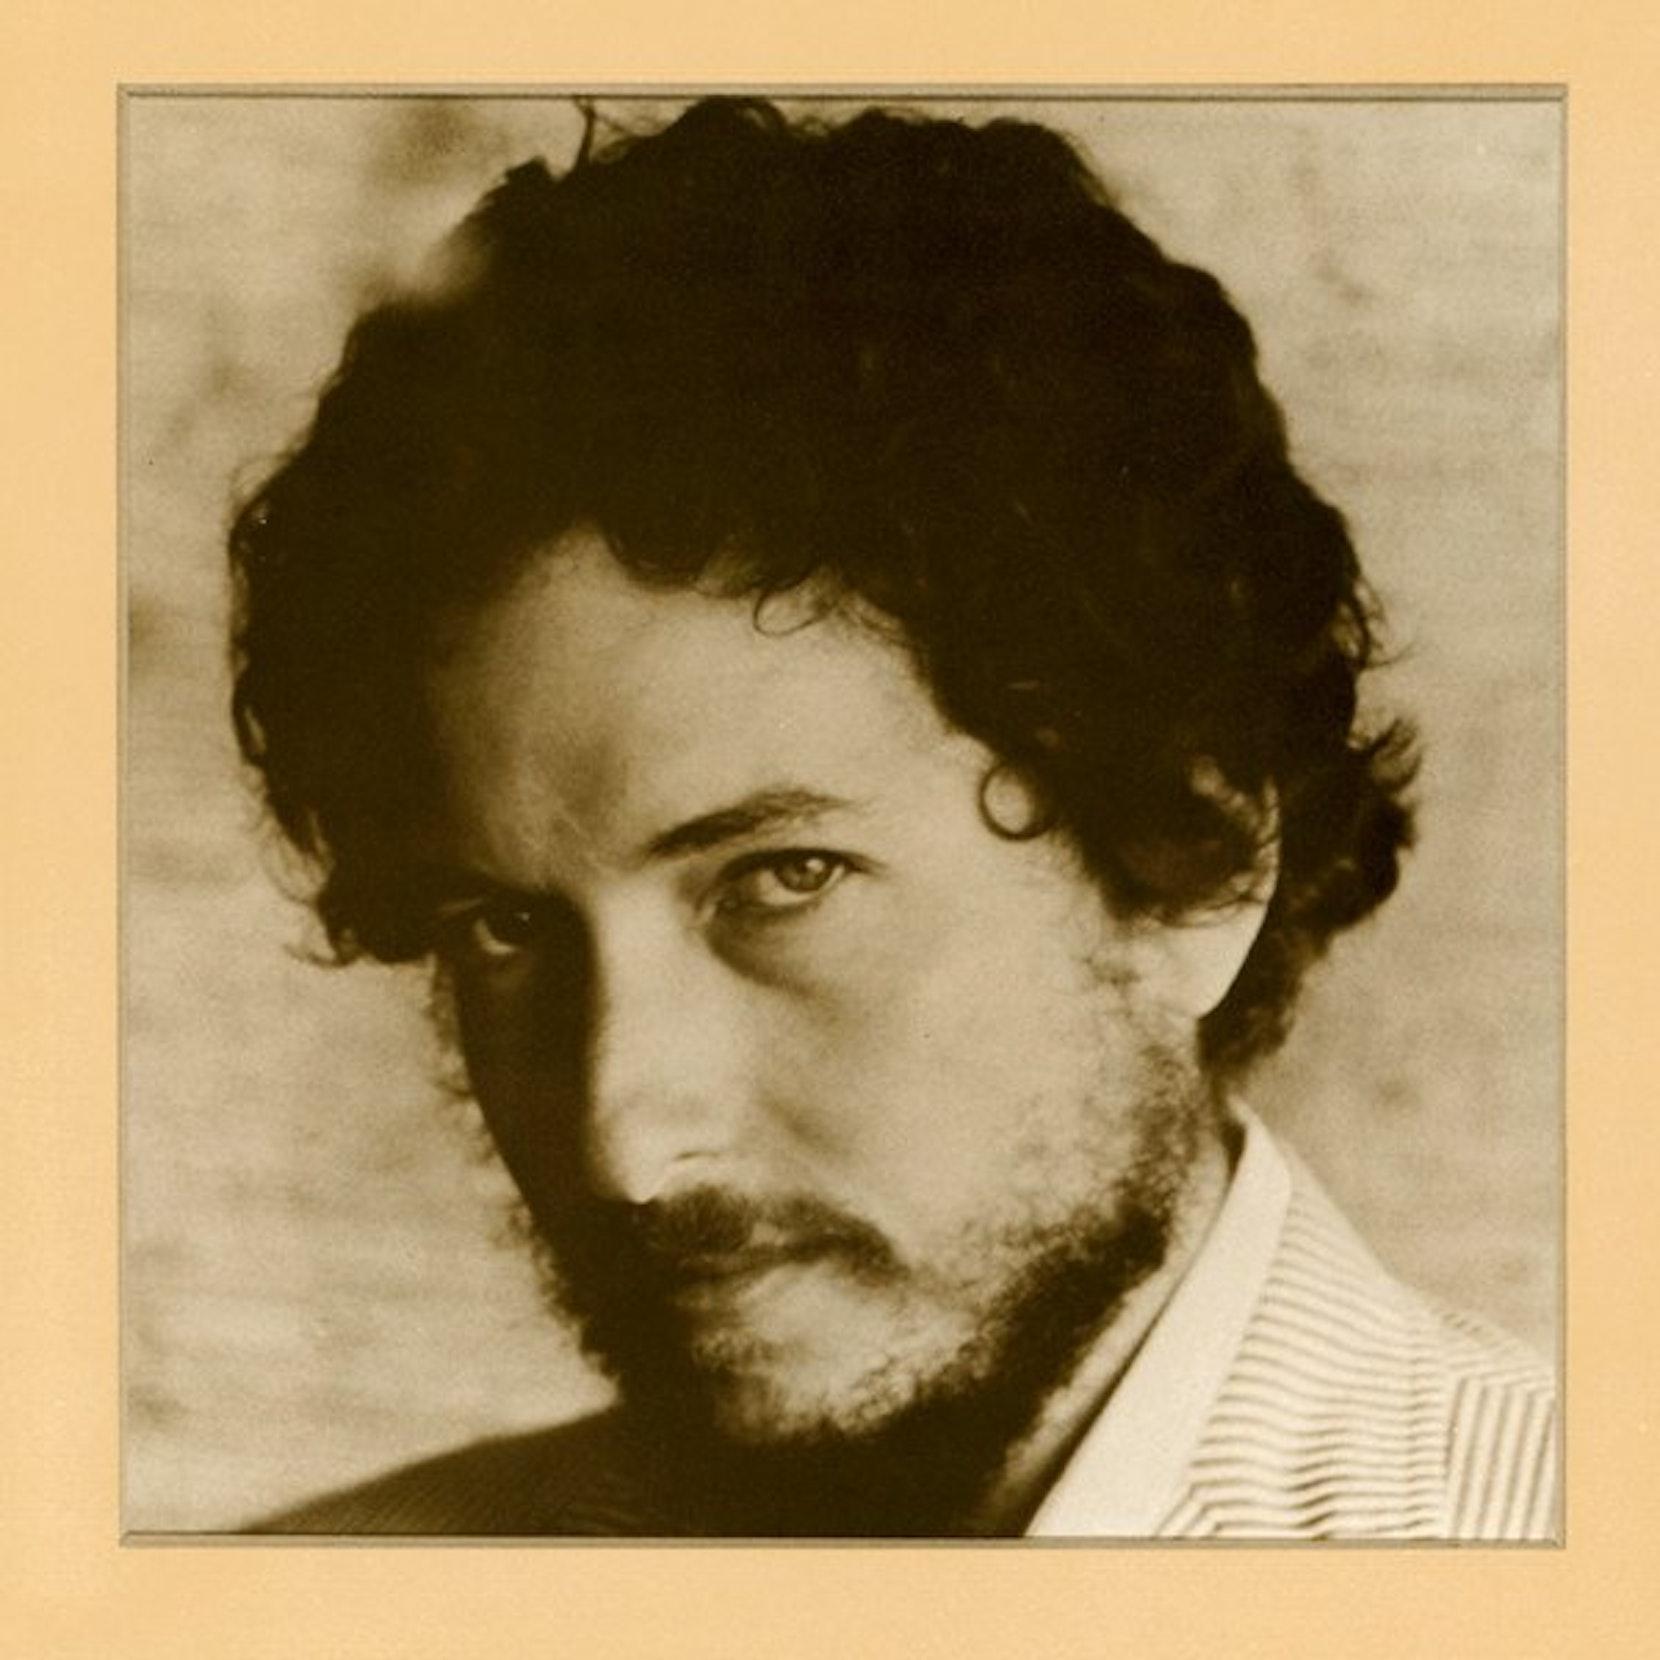 The 10 Best Bob Dylan Albums To Own On Vinyl — Vinyl Me, Please